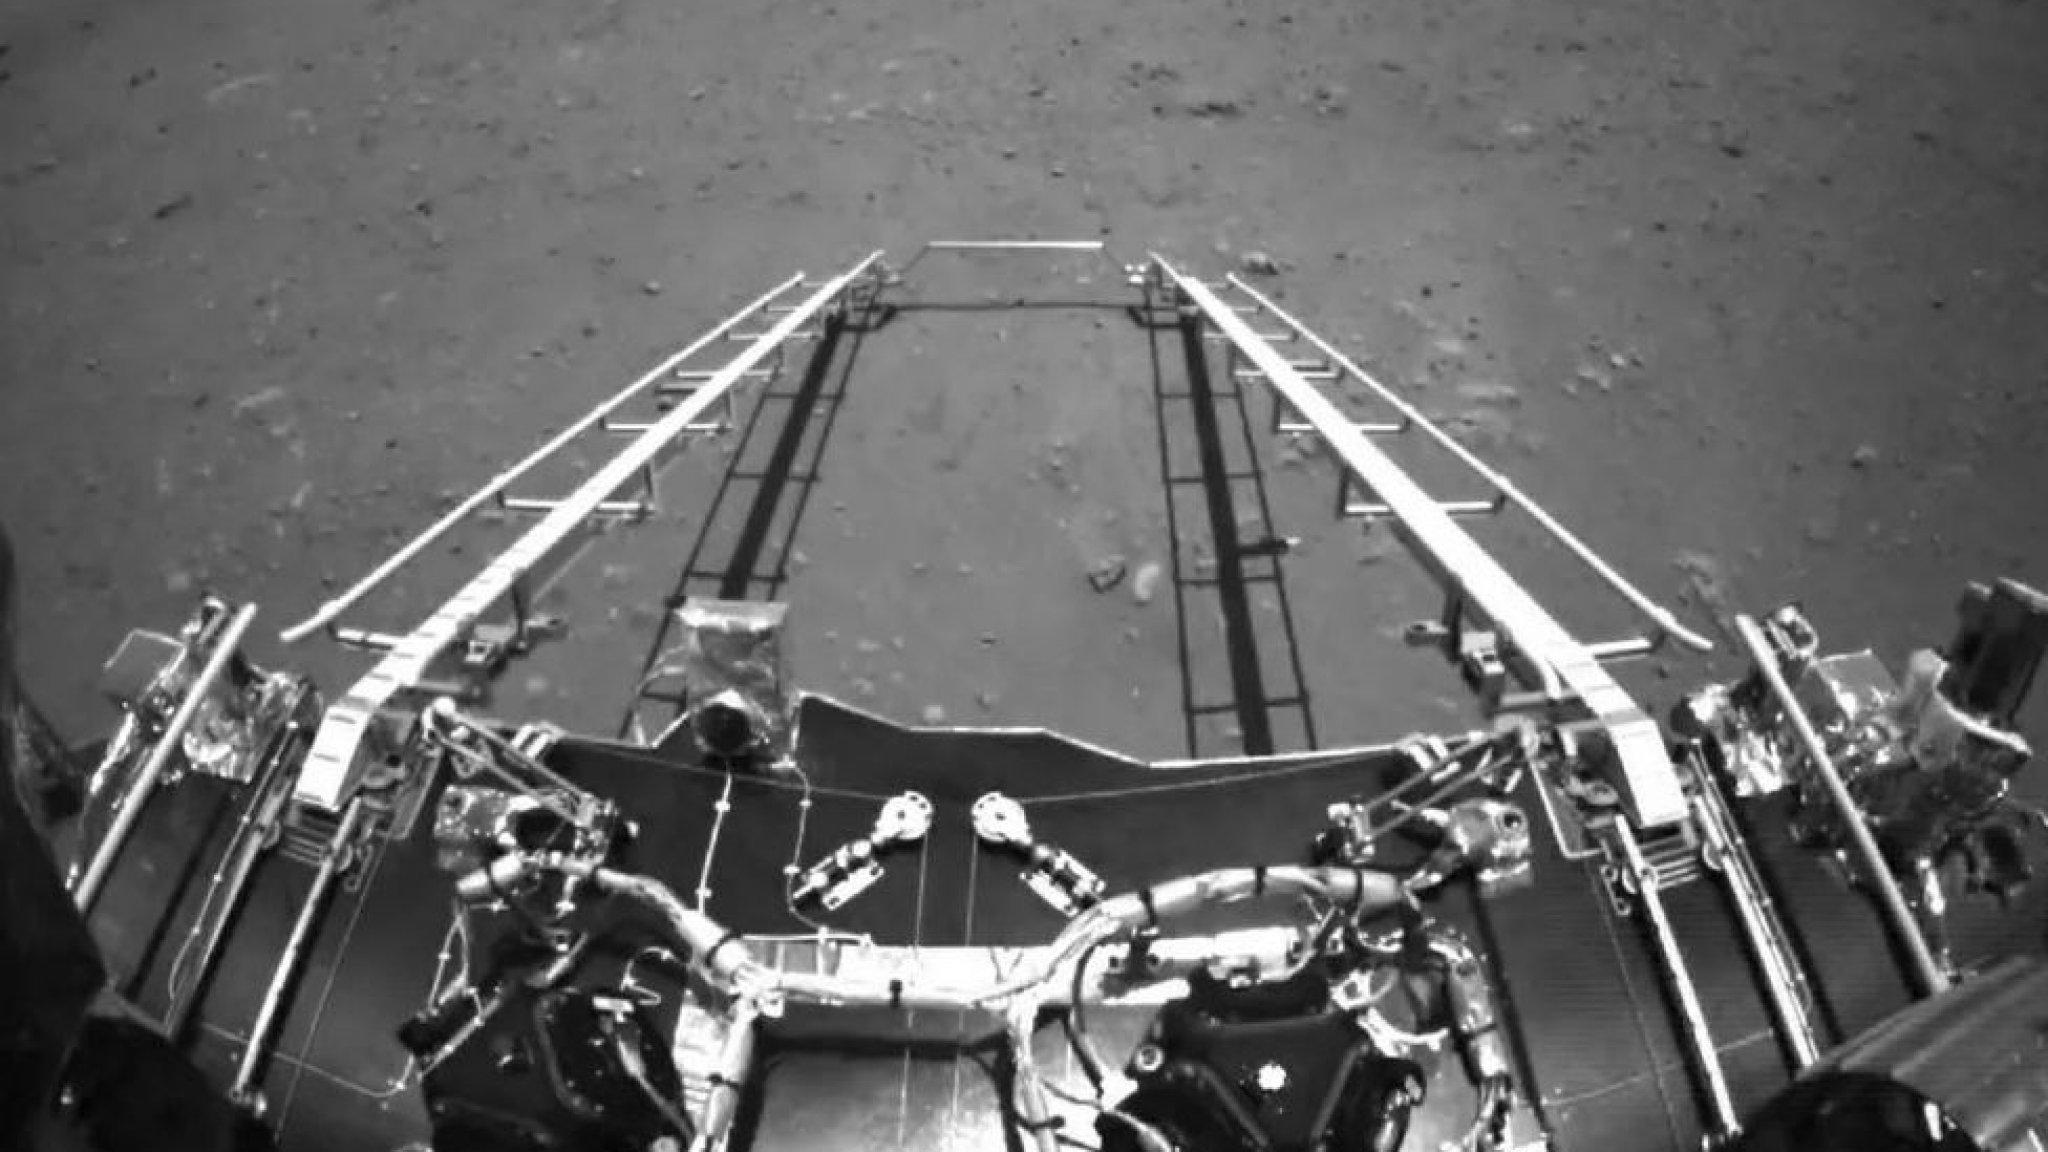 kineski-rover-na-marsu